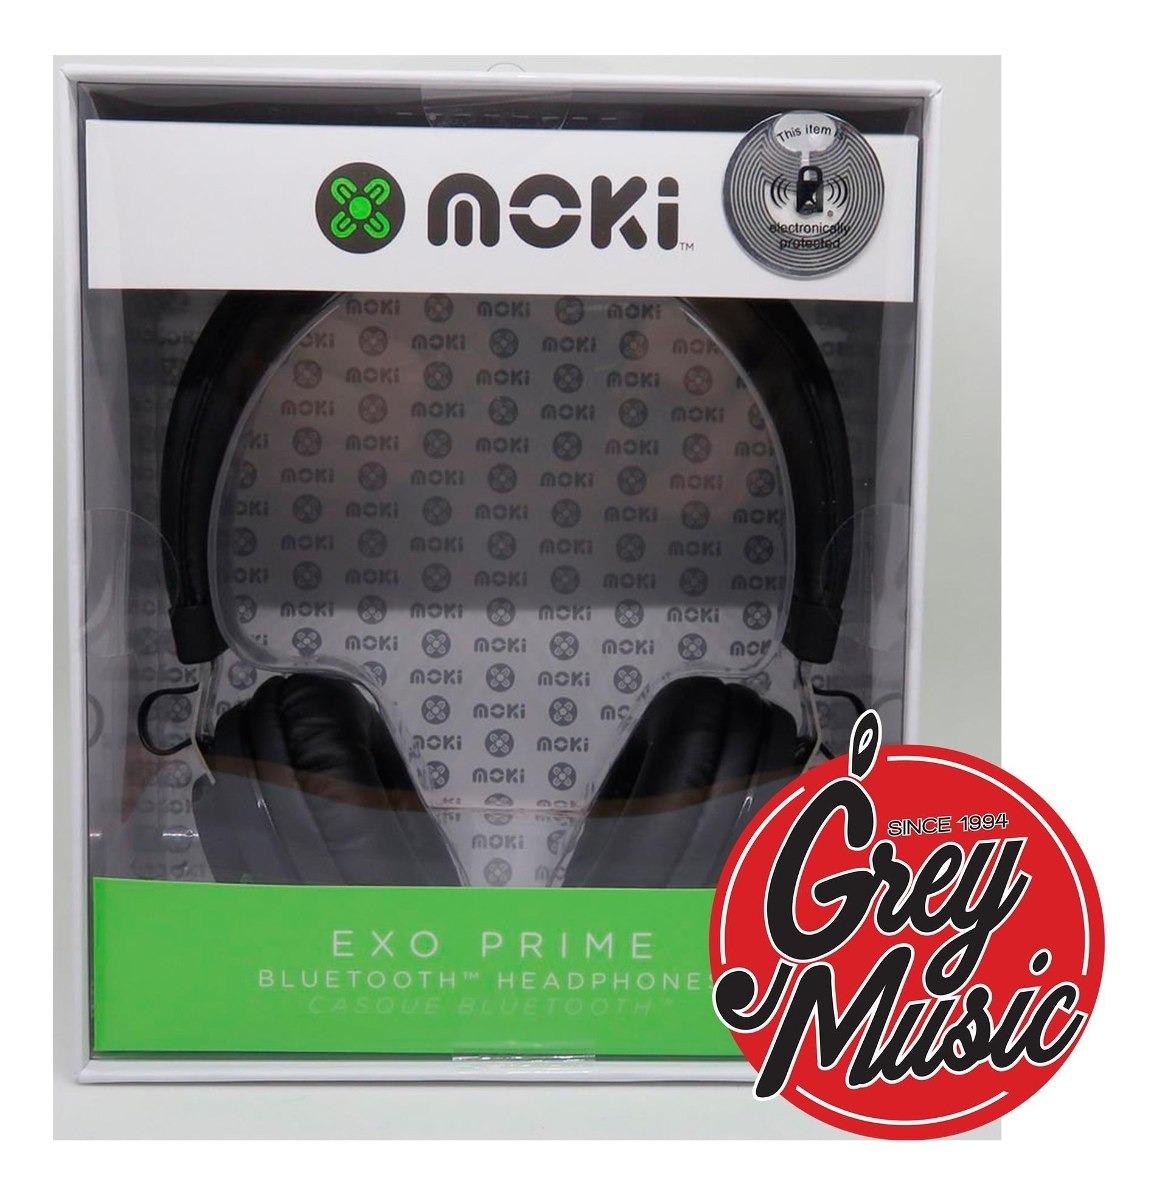 Auricular Moki Acc Hpexpri Exo Prime Bluetooth - Black Negro